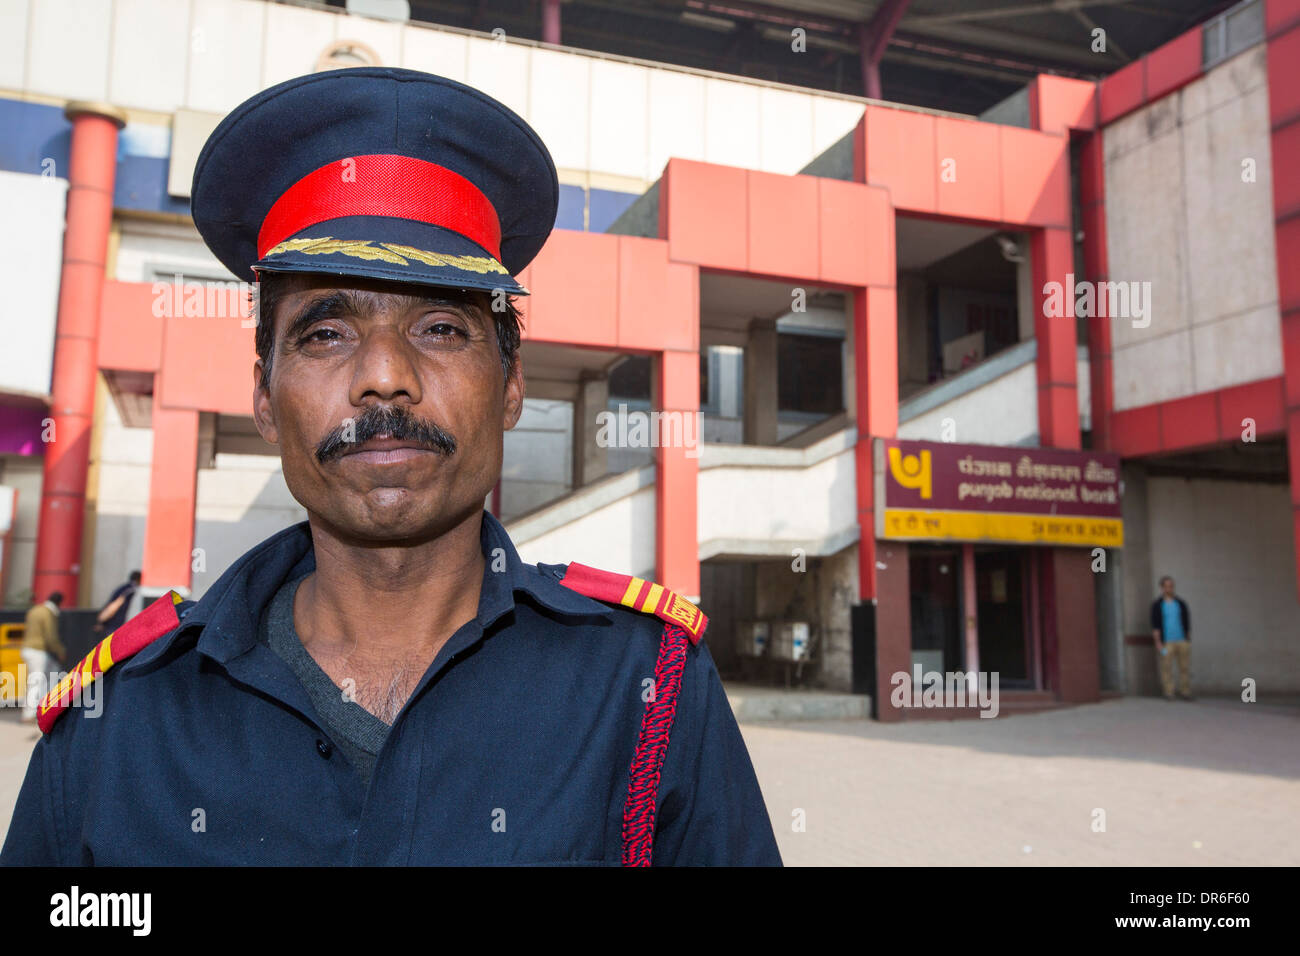 A security guard outside the Delhi Metro, Delhi, India. - Stock Image